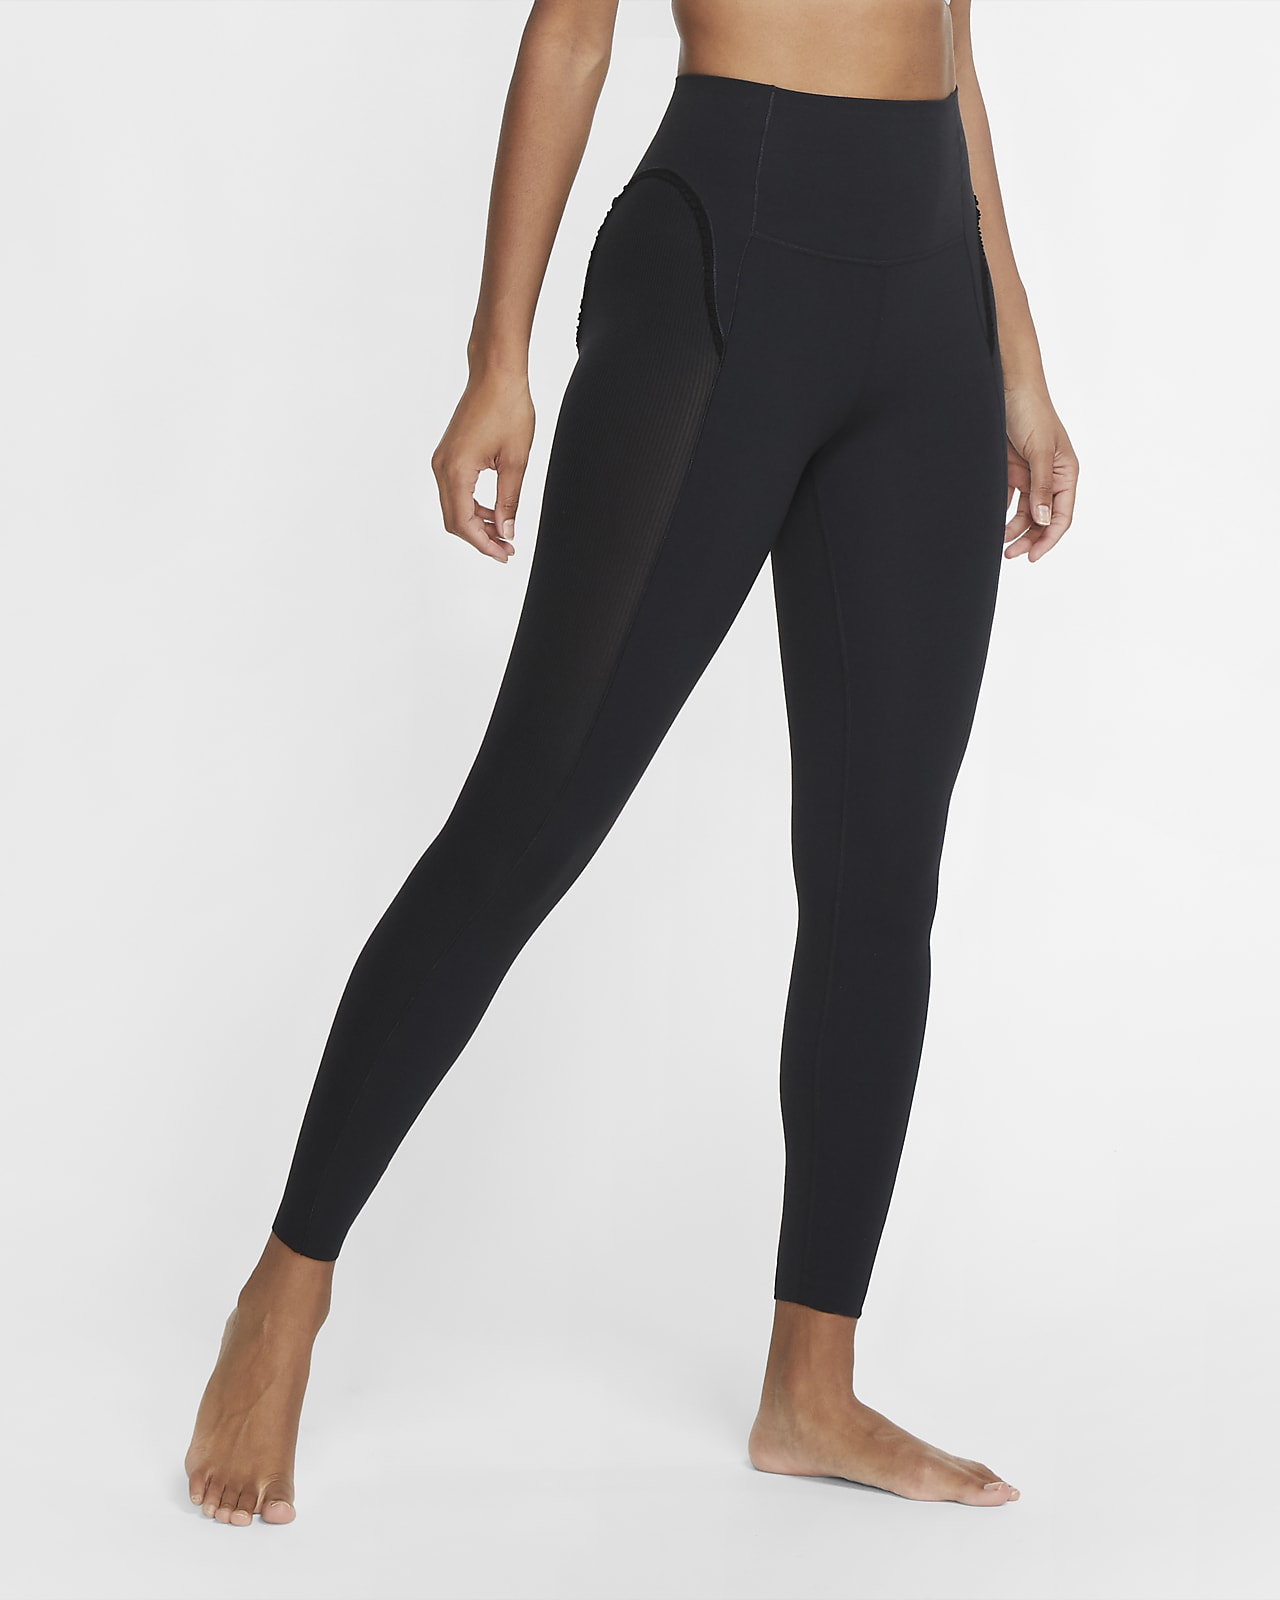 Leggings de 7/8 de tela ondulada Infinalon para mujer Nike Yoga Luxe